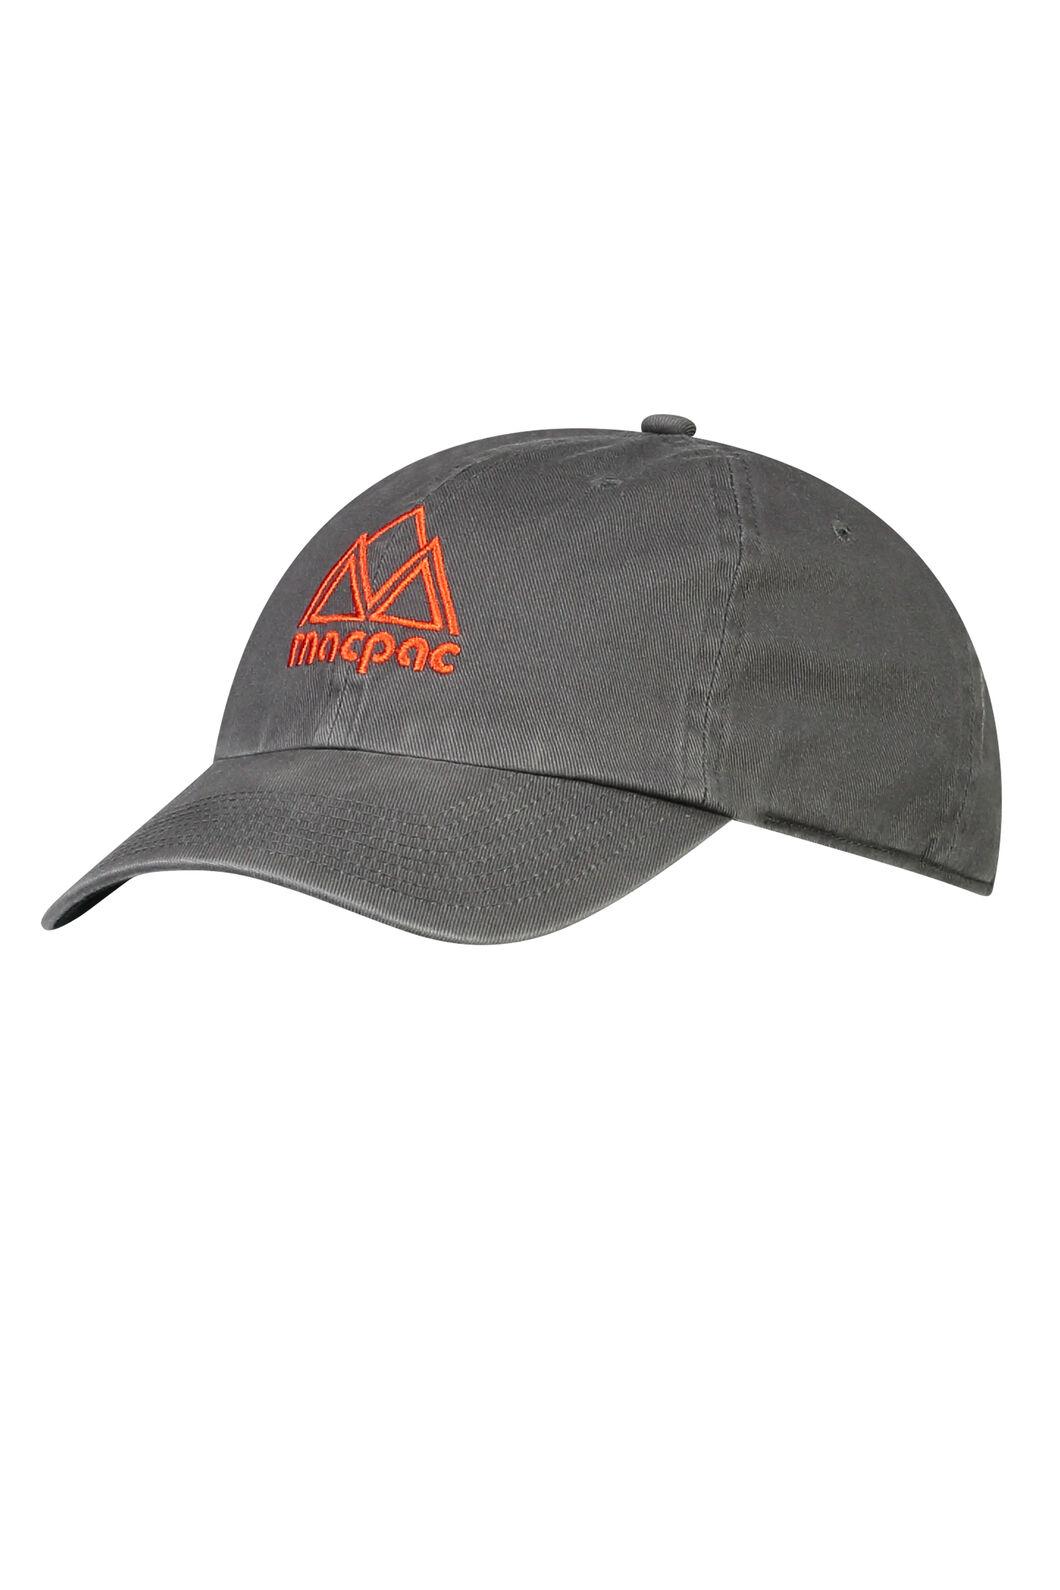 Macpac Vintage Cap, Charcoal/Indicator, hi-res